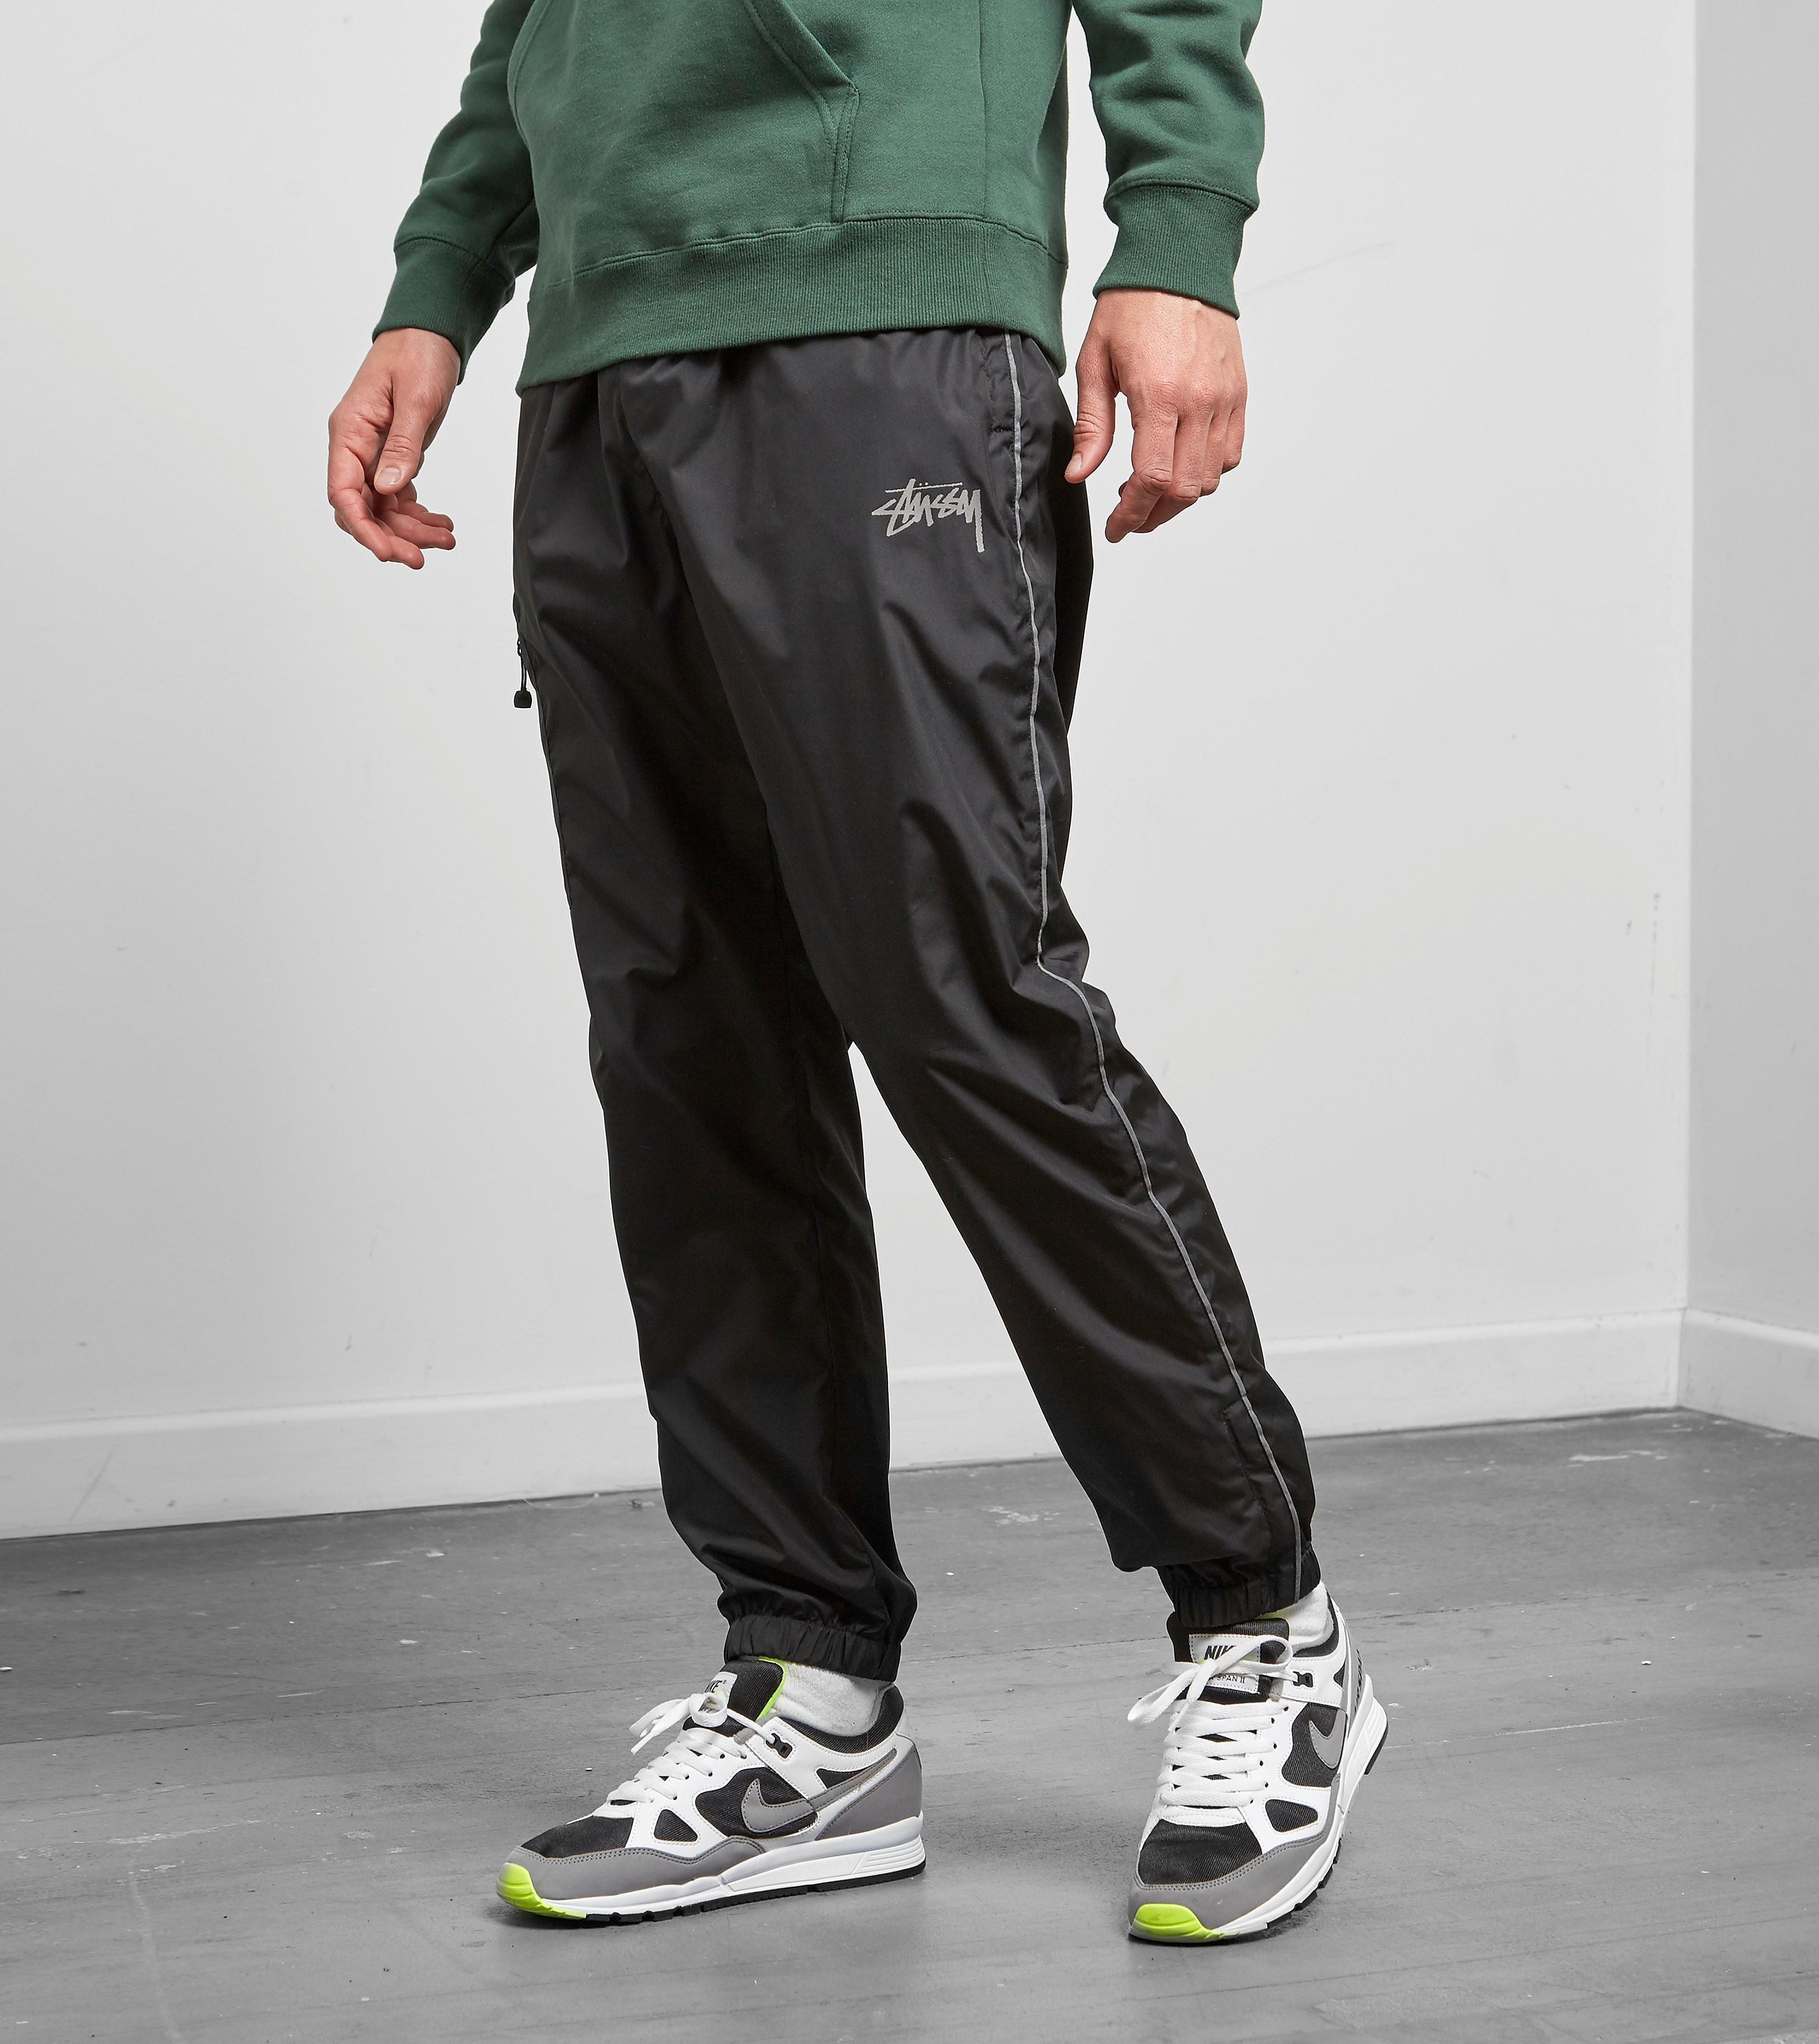 Stussy Side Pocket Nylon Pant